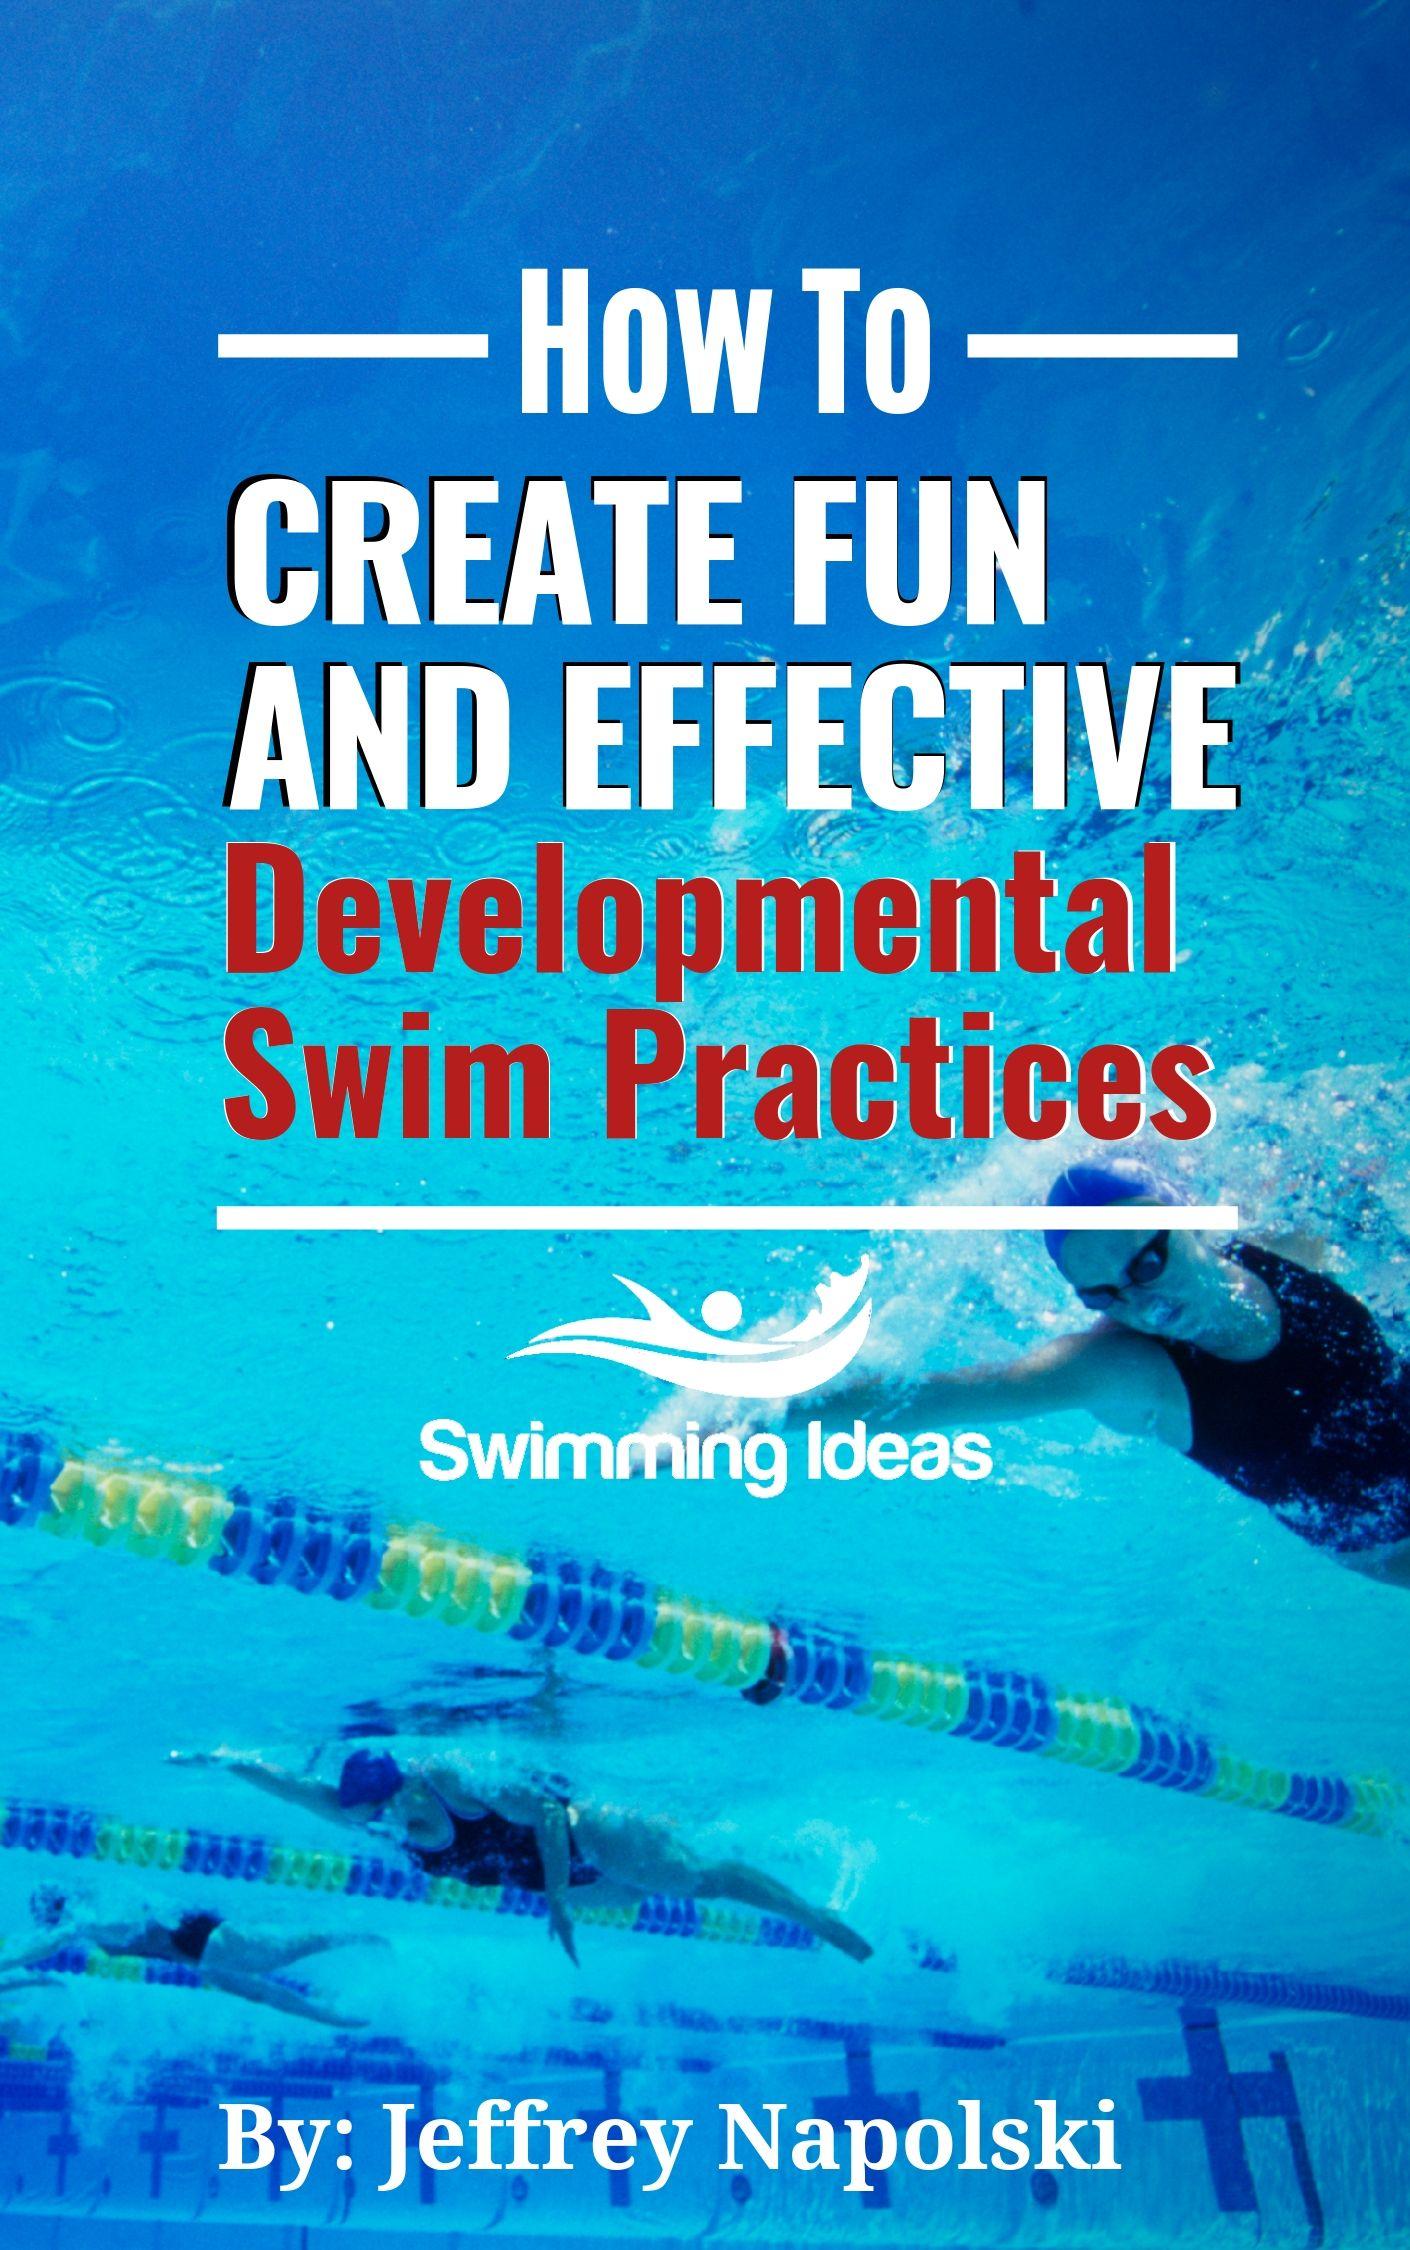 How to Create Fun and Effective Developmental Swim Practices